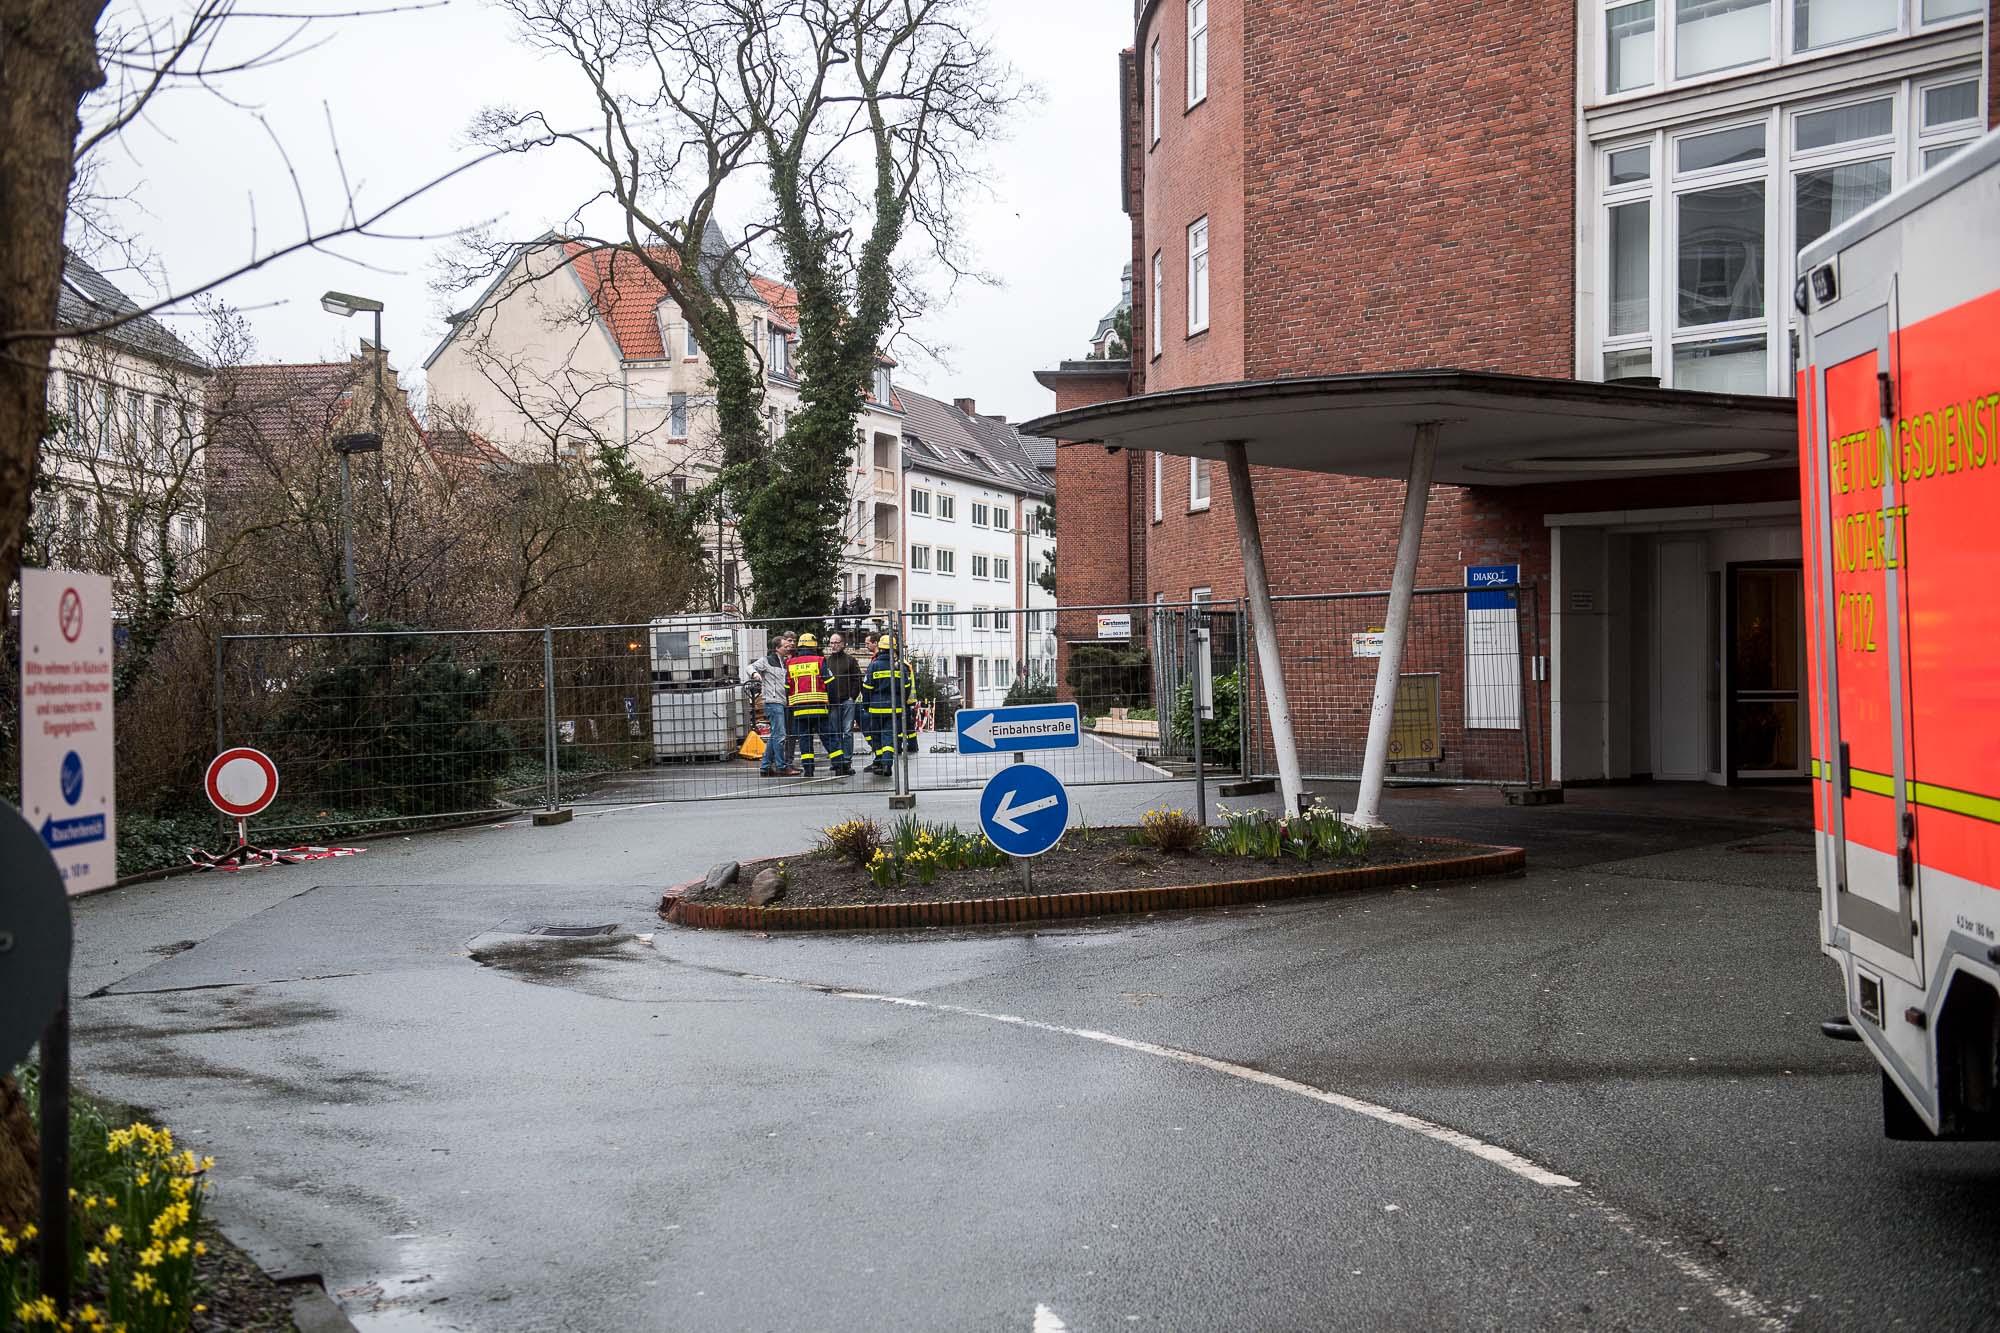 Flensburg Diako